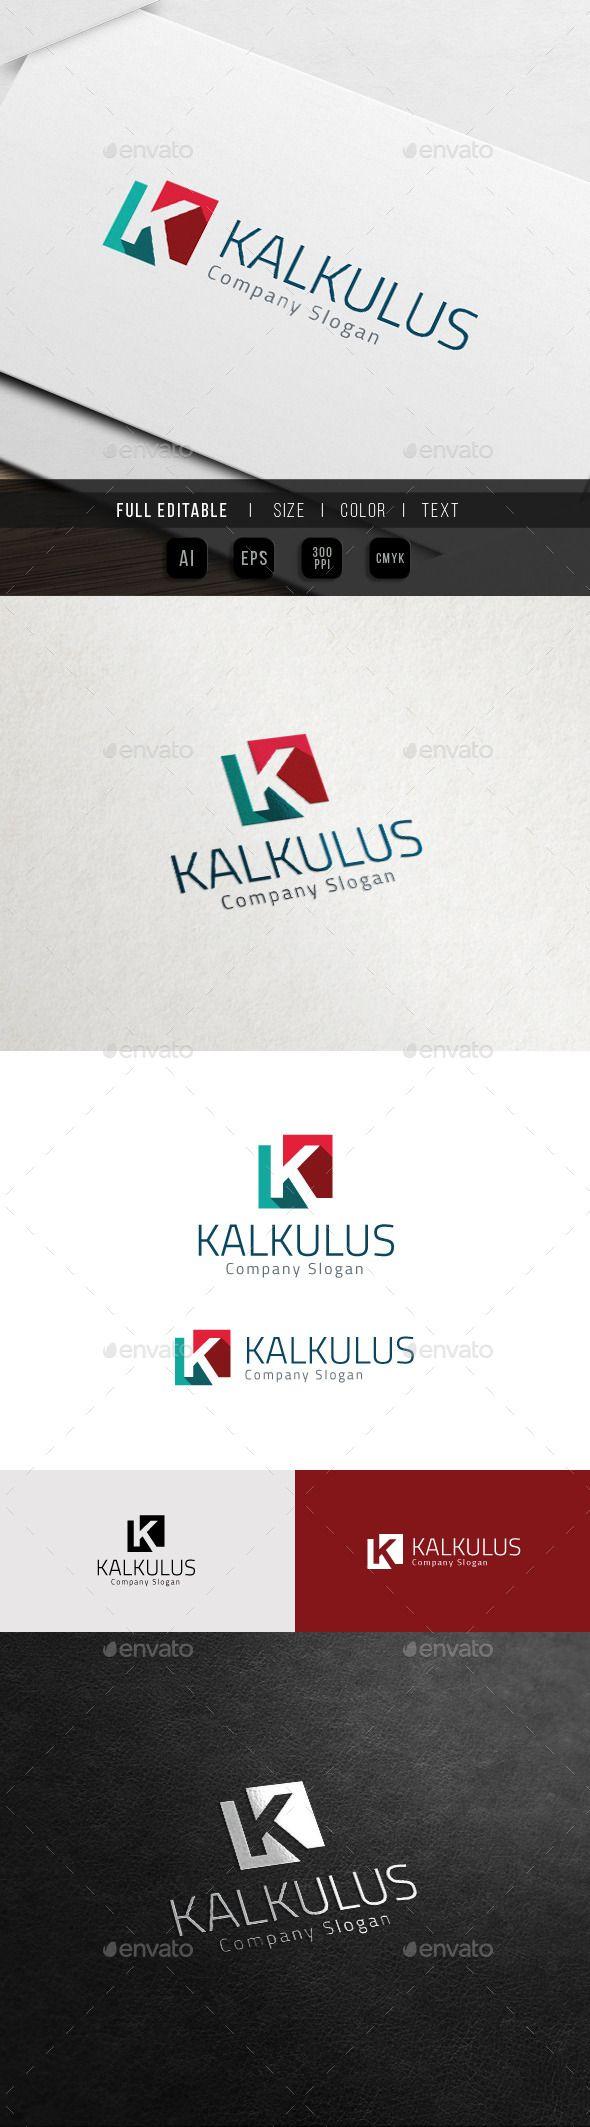 Corporate Brand Marketing Finance K - Logo Design Template Vector #logotype Download it here: http://graphicriver.net/item/corporate-brand-marketing-finance-k-logo/11515857?s_rank=611?ref=nesto